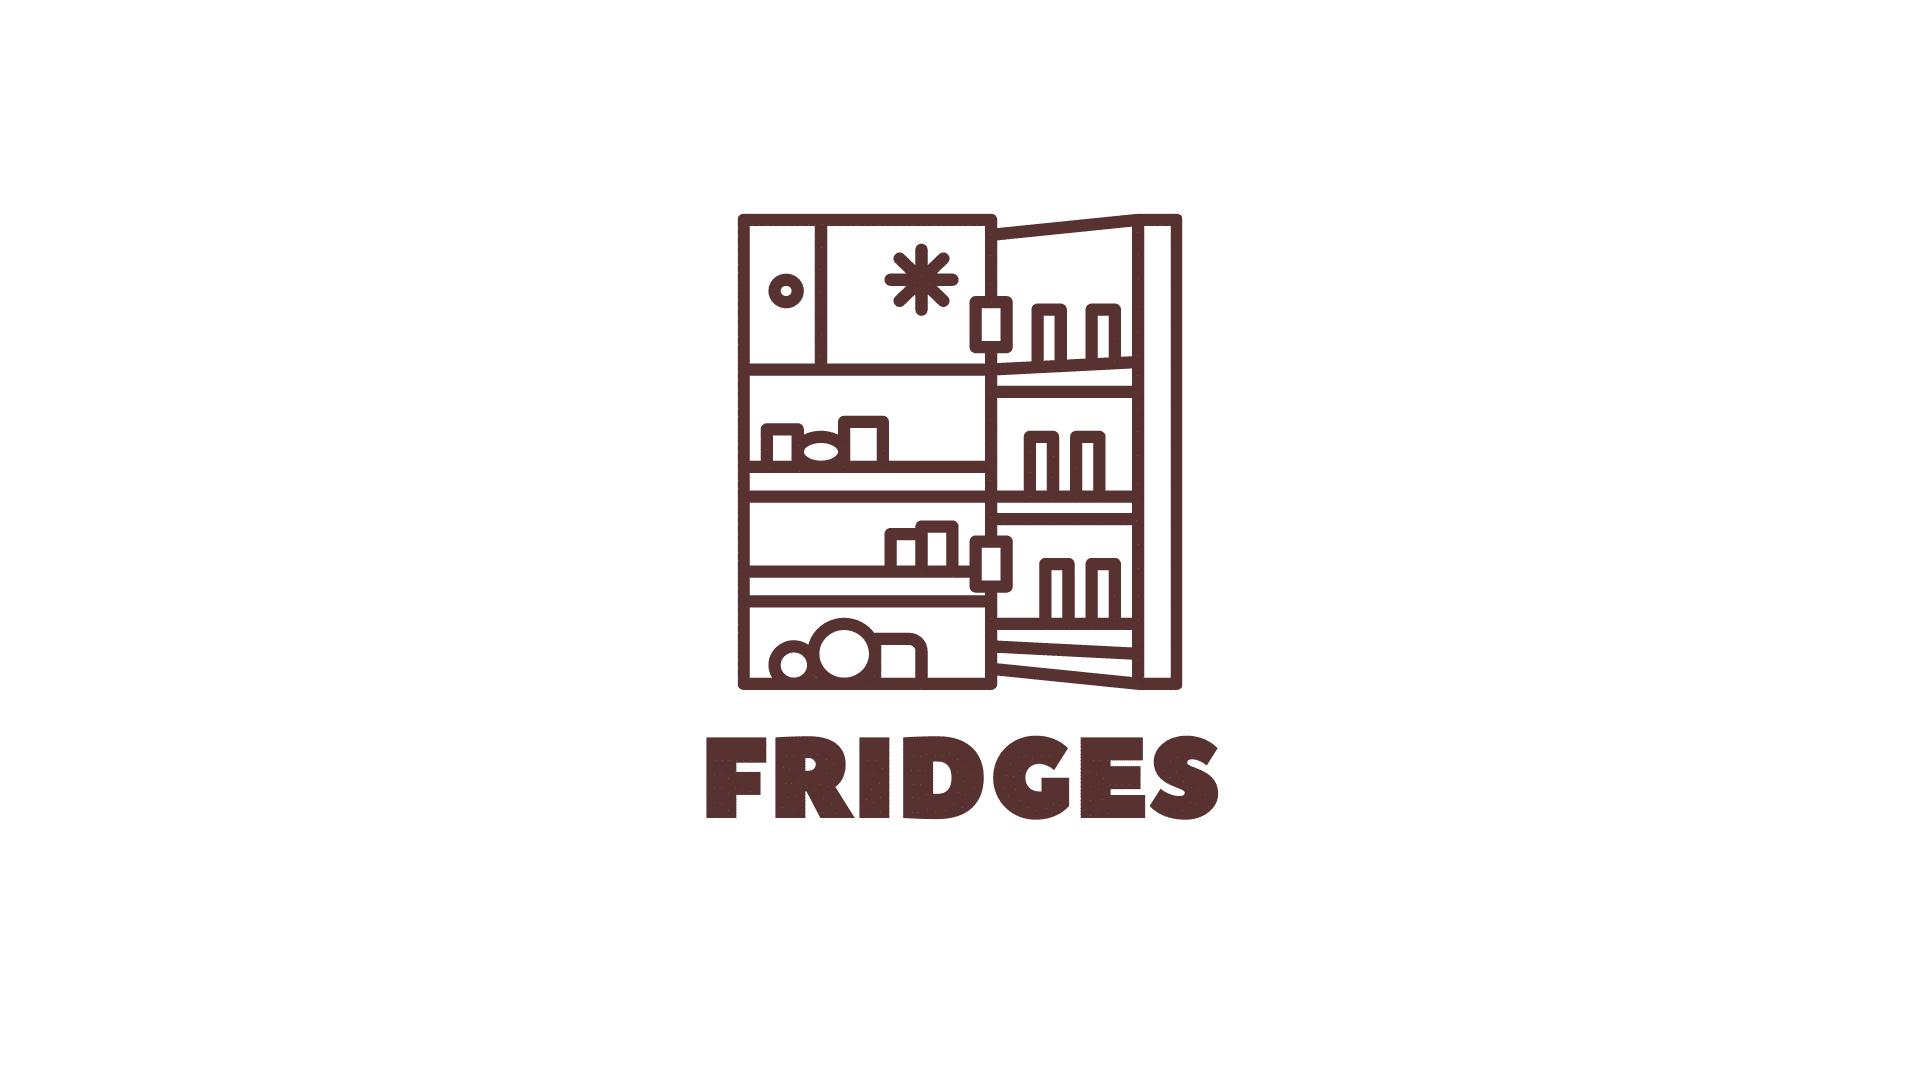 Refrigerators 1